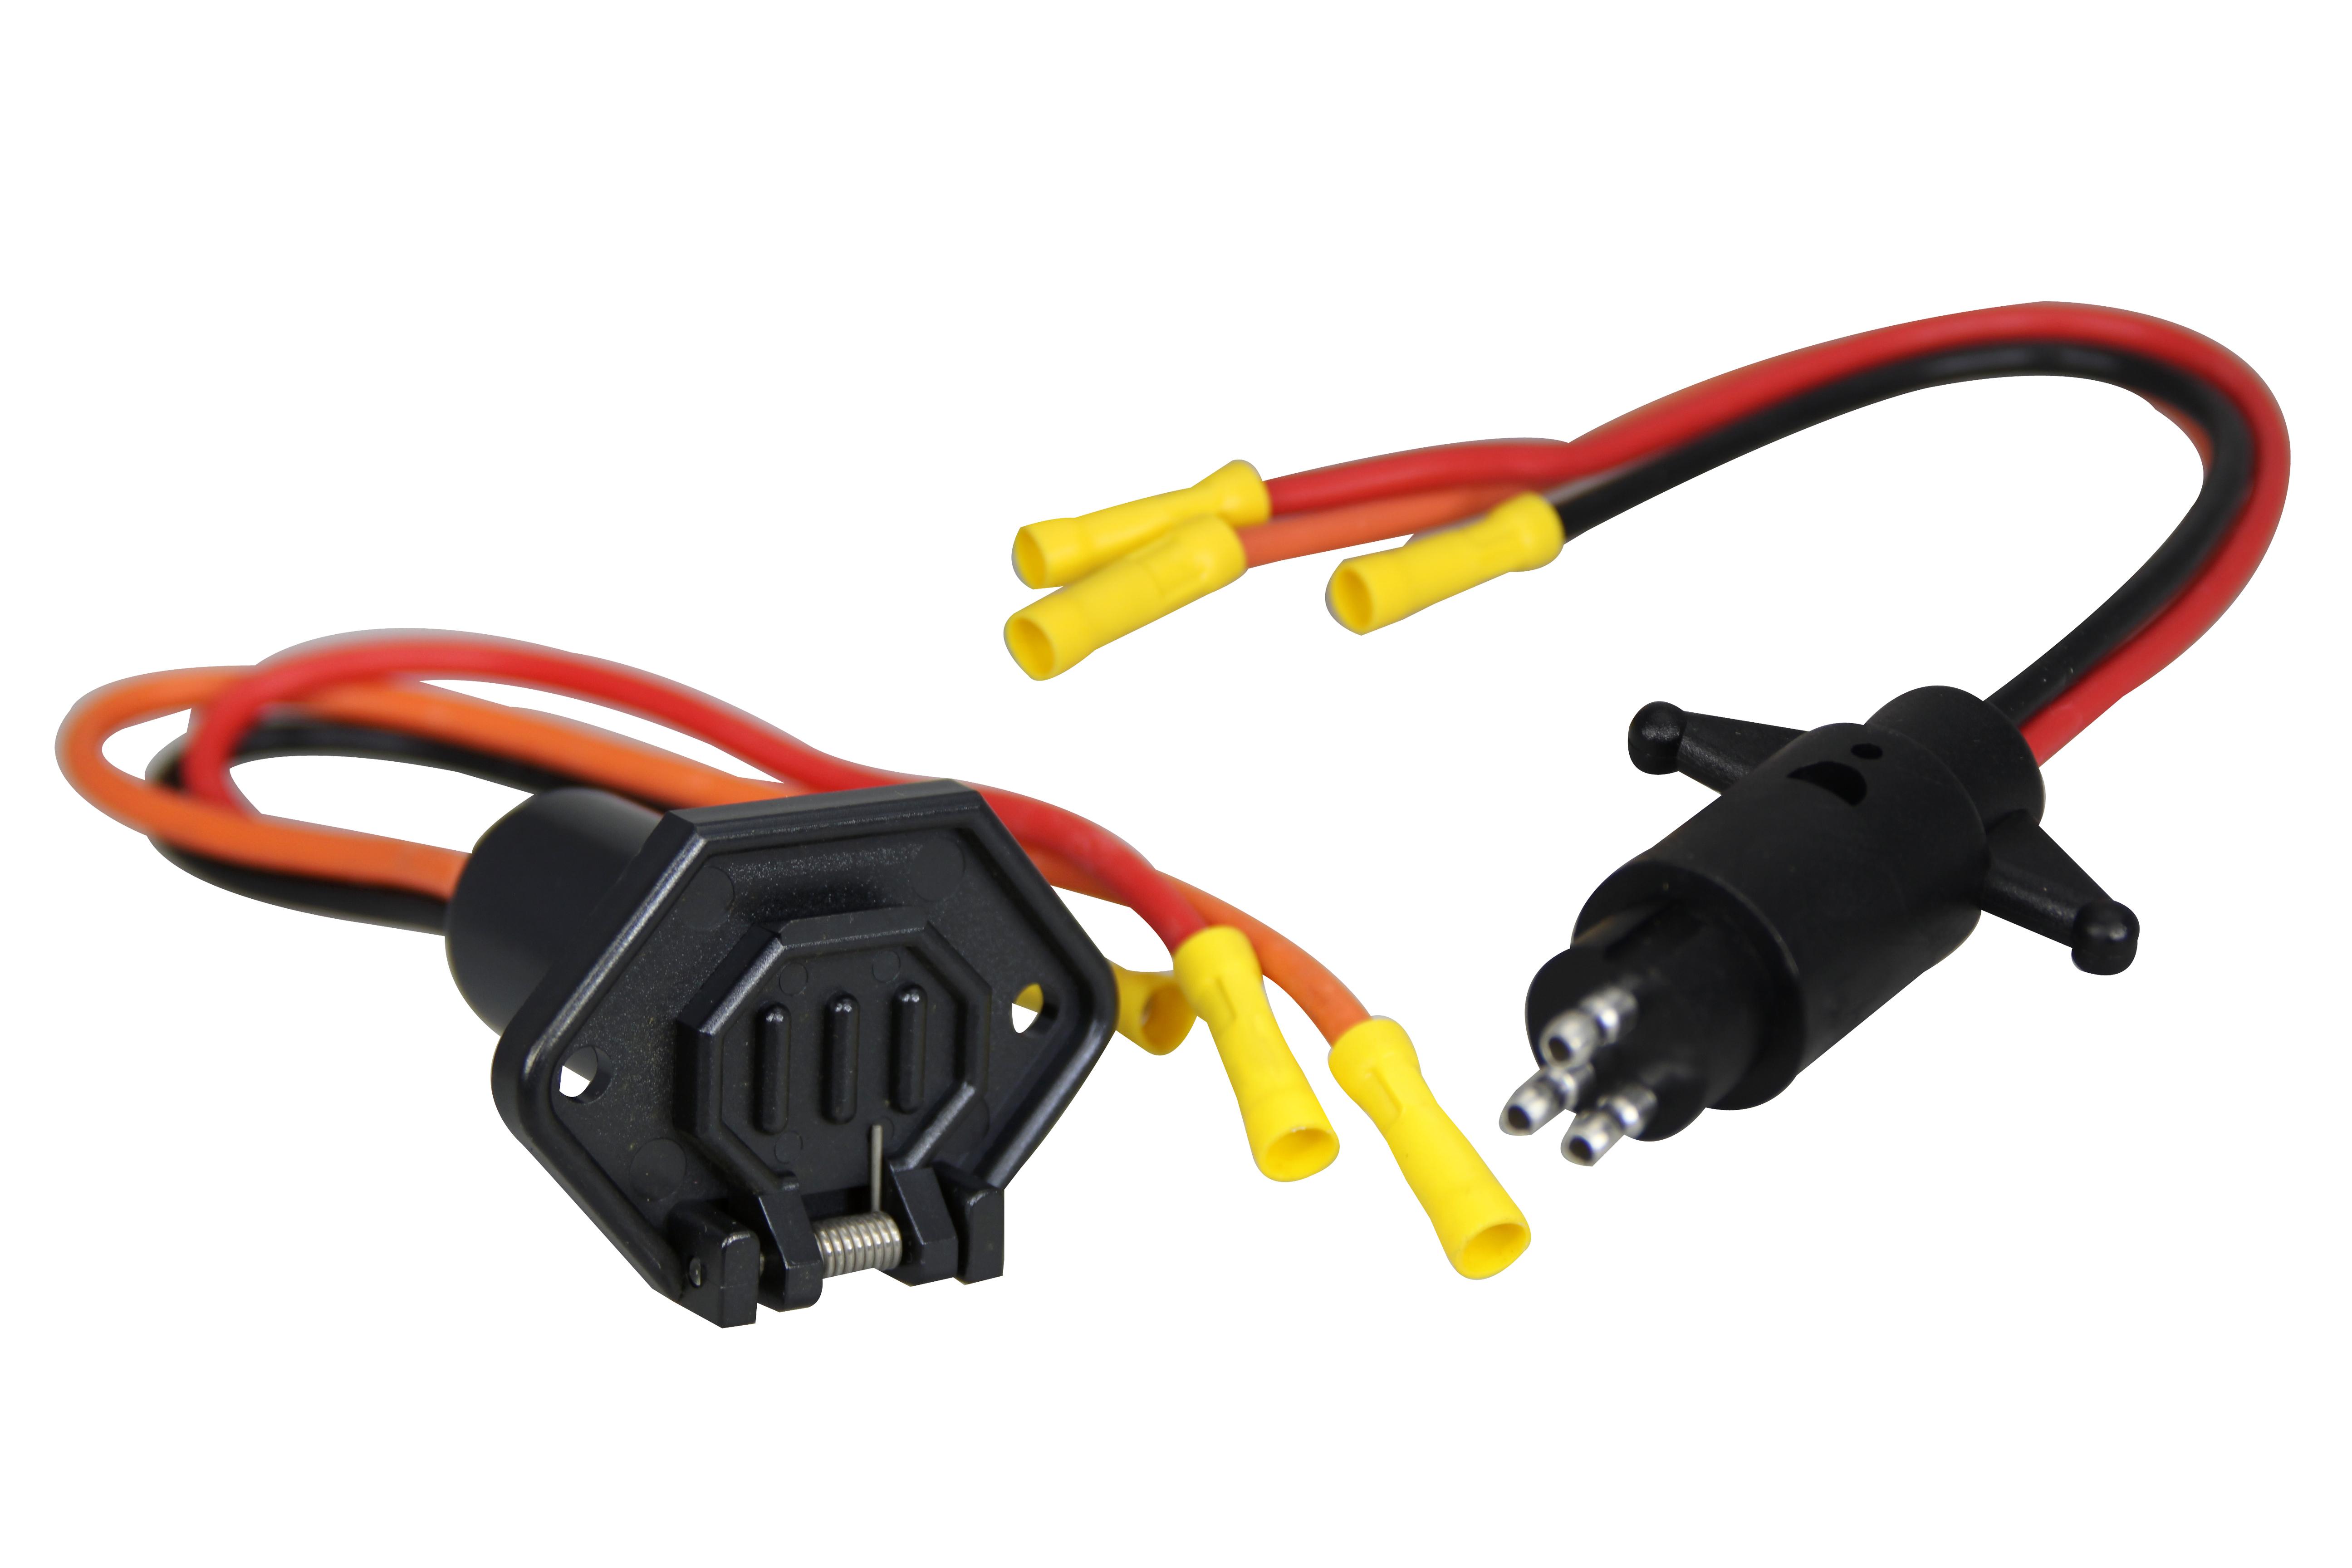 24v Trolling Motor Wiring Gauge Solutions Plug Diagram 3 Wire Connecter Pactrade Marine Boat Socket Set 12